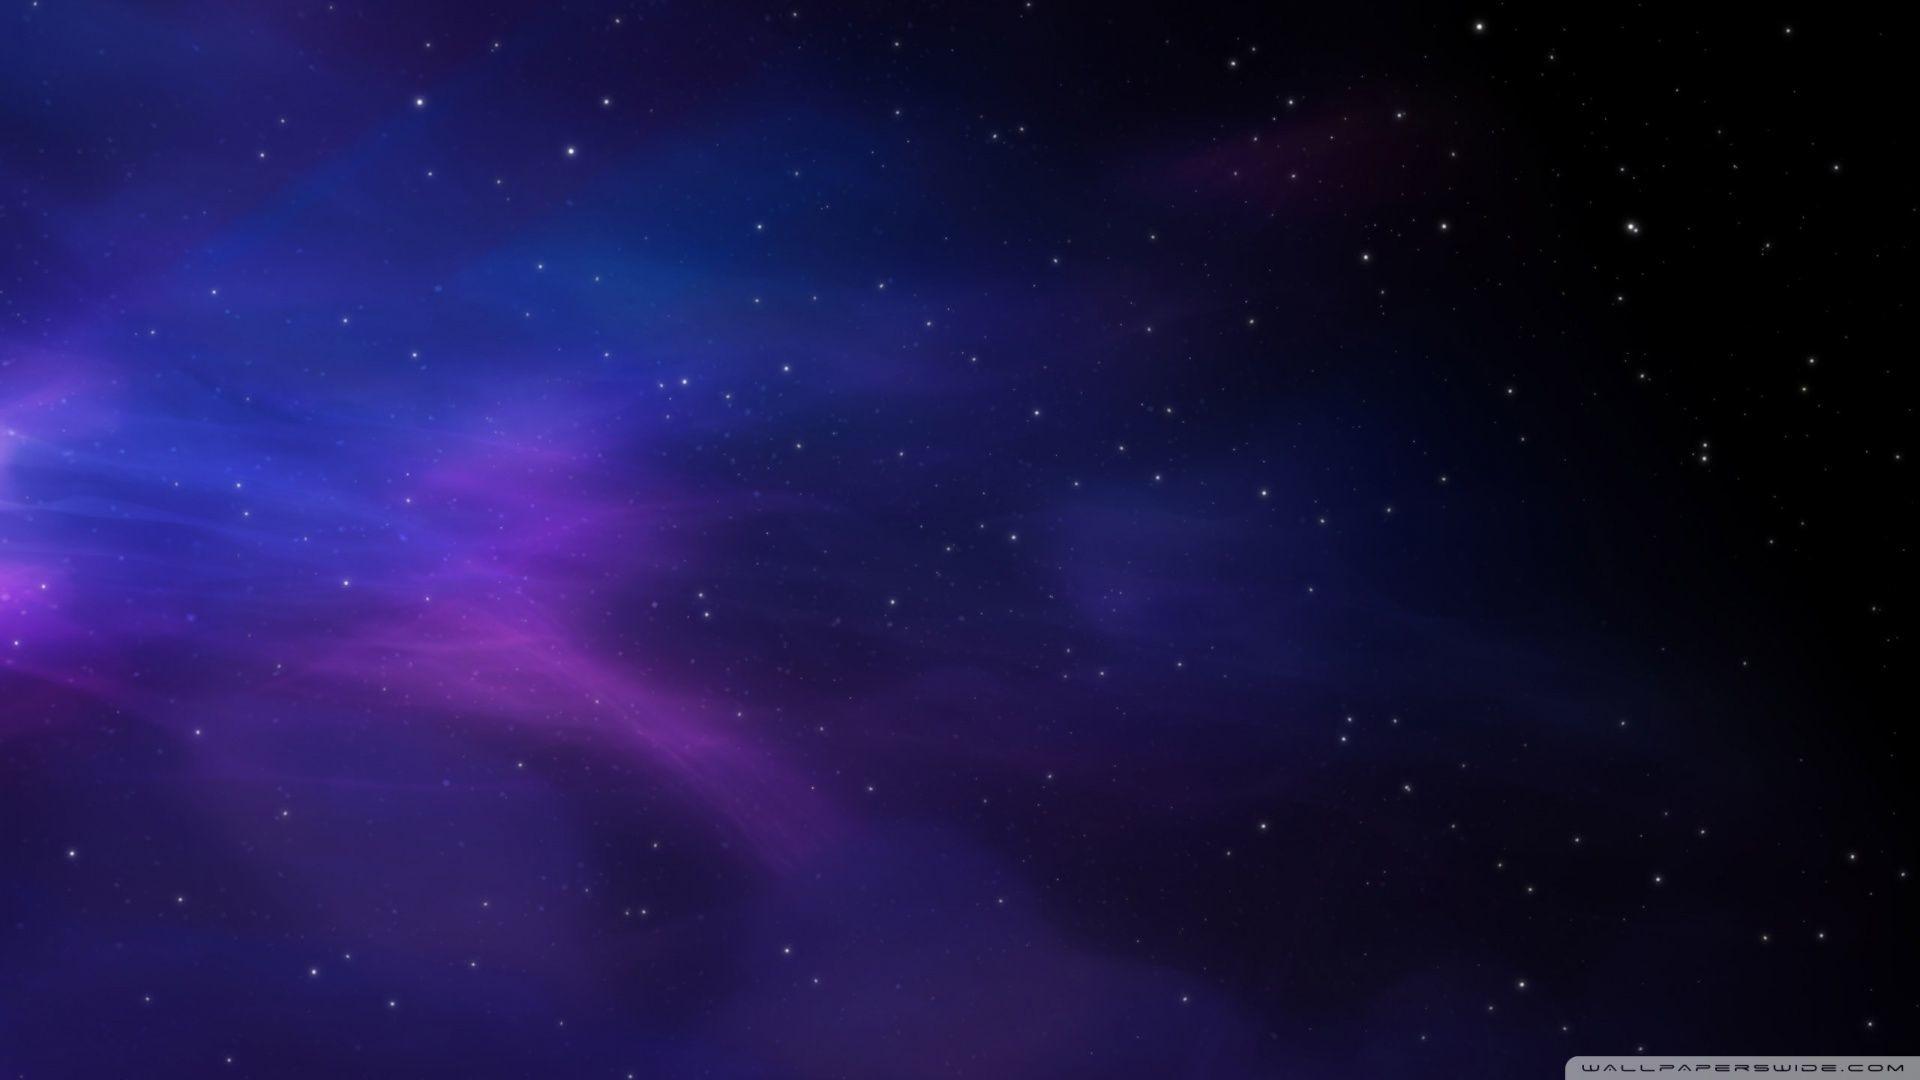 Download Space Colors Blue Purple Stars Wallpaper .